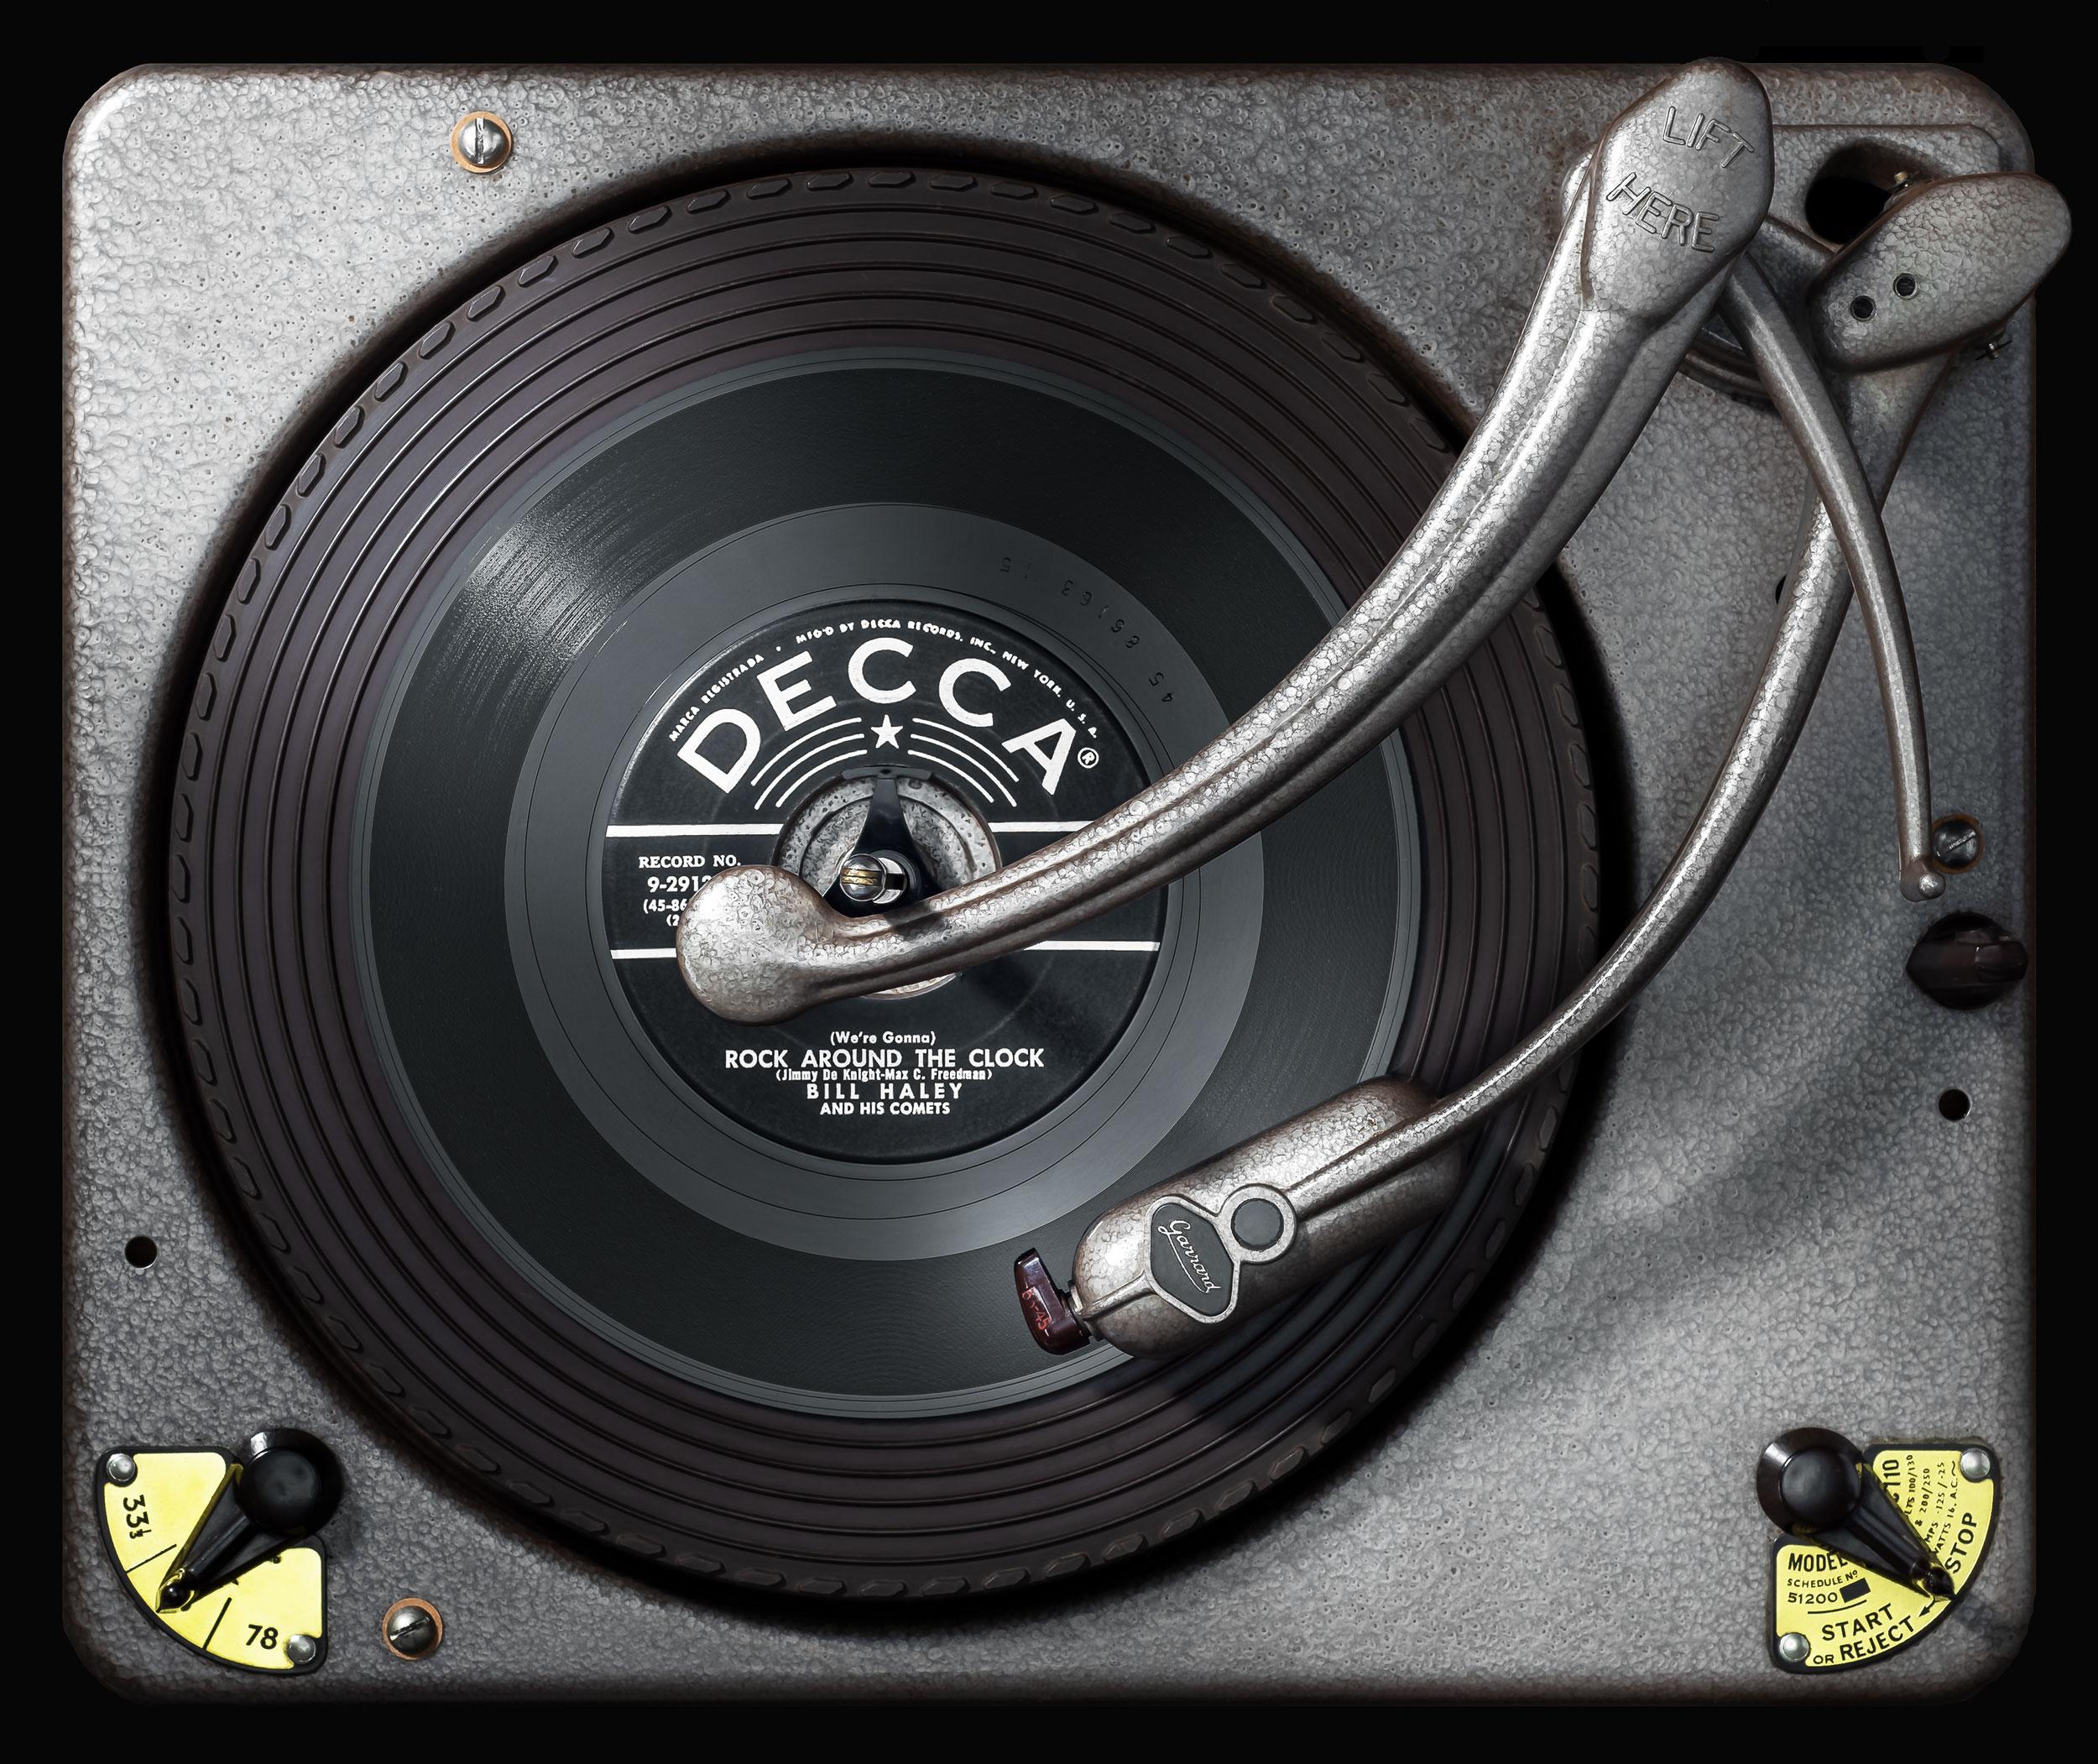 Vinylography No. 11 Bill Haley Rock Around The Clock on Garrard RC 110